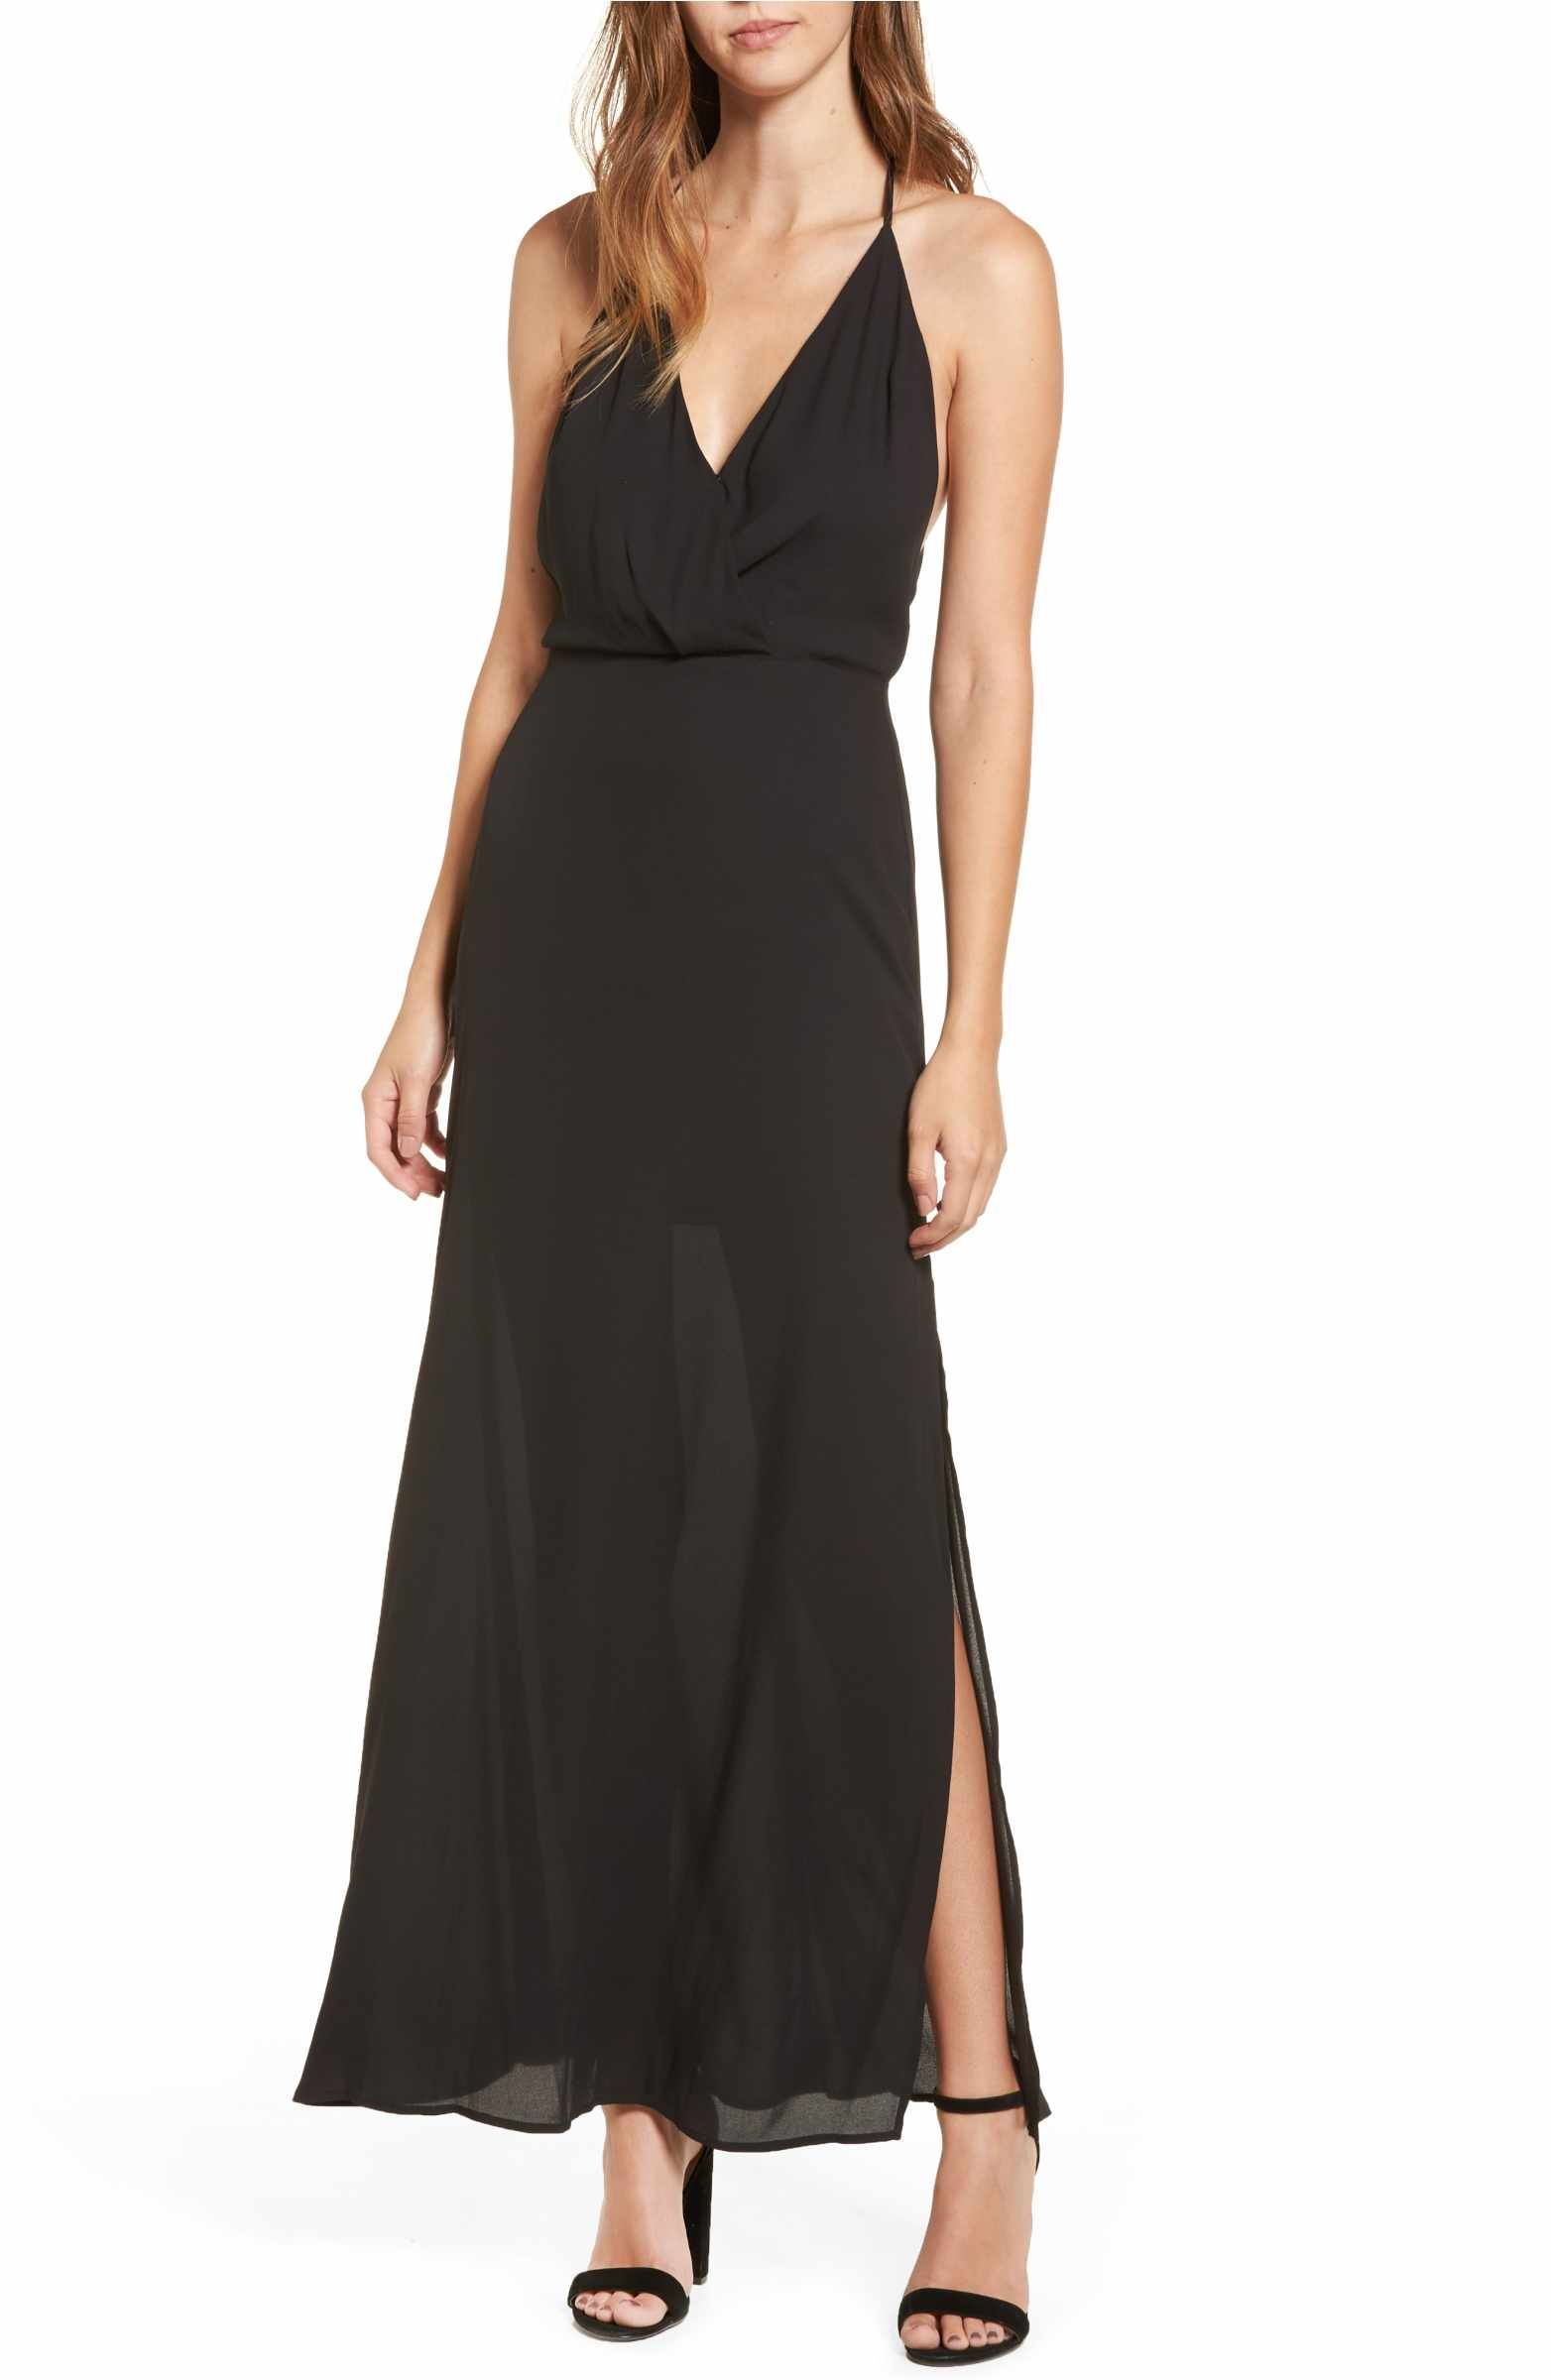 Dressy Black Maxi Dresses